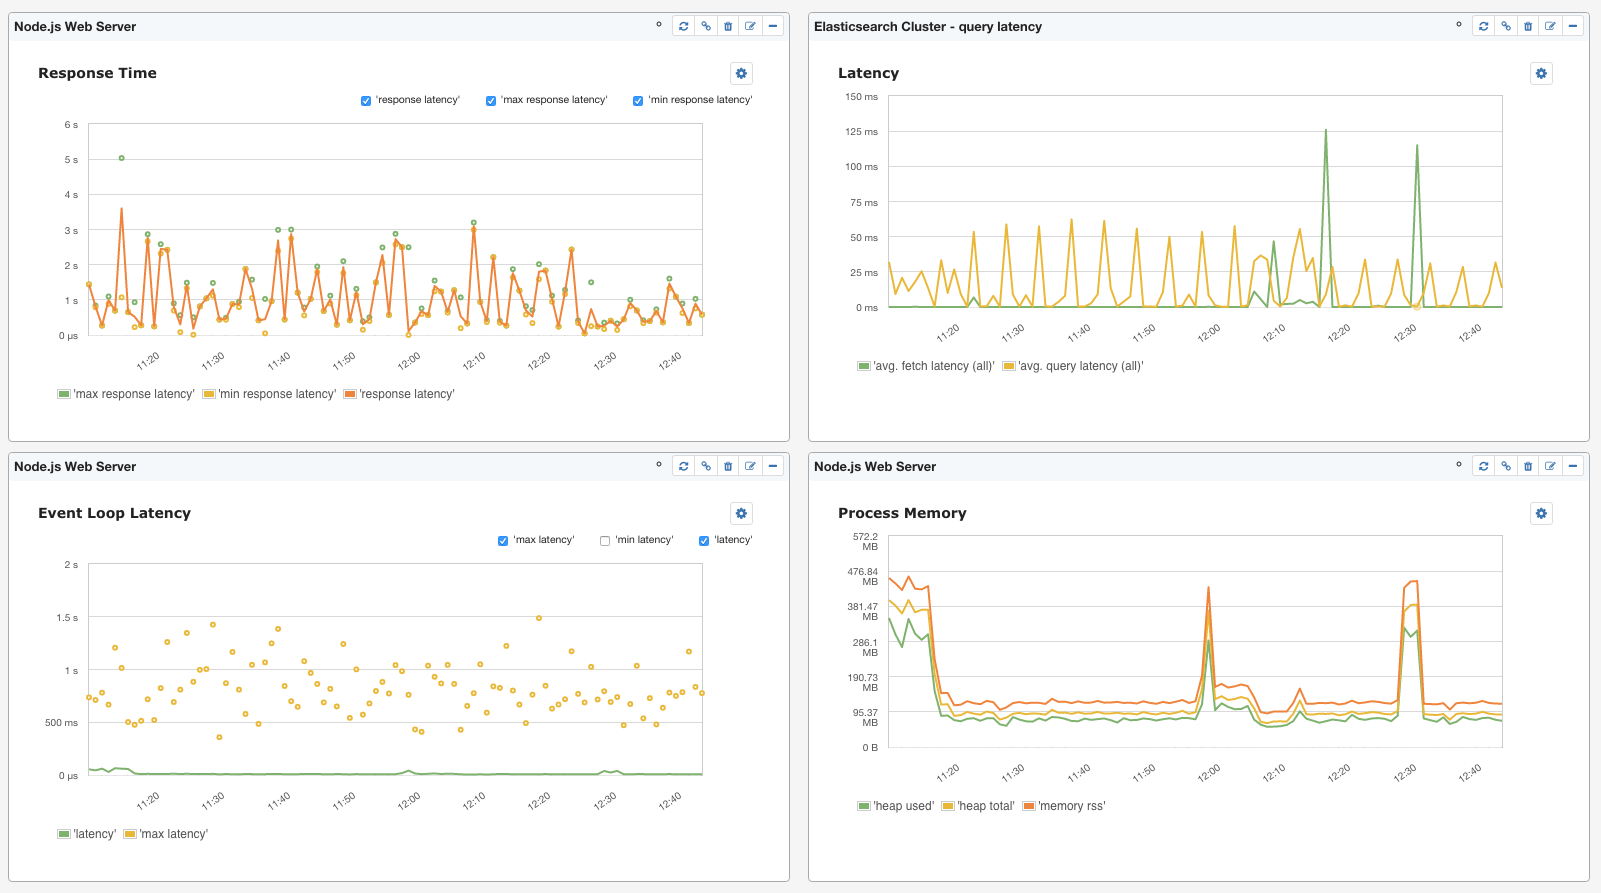 Combined dashboard of Node.js and Elasticsearch metrics